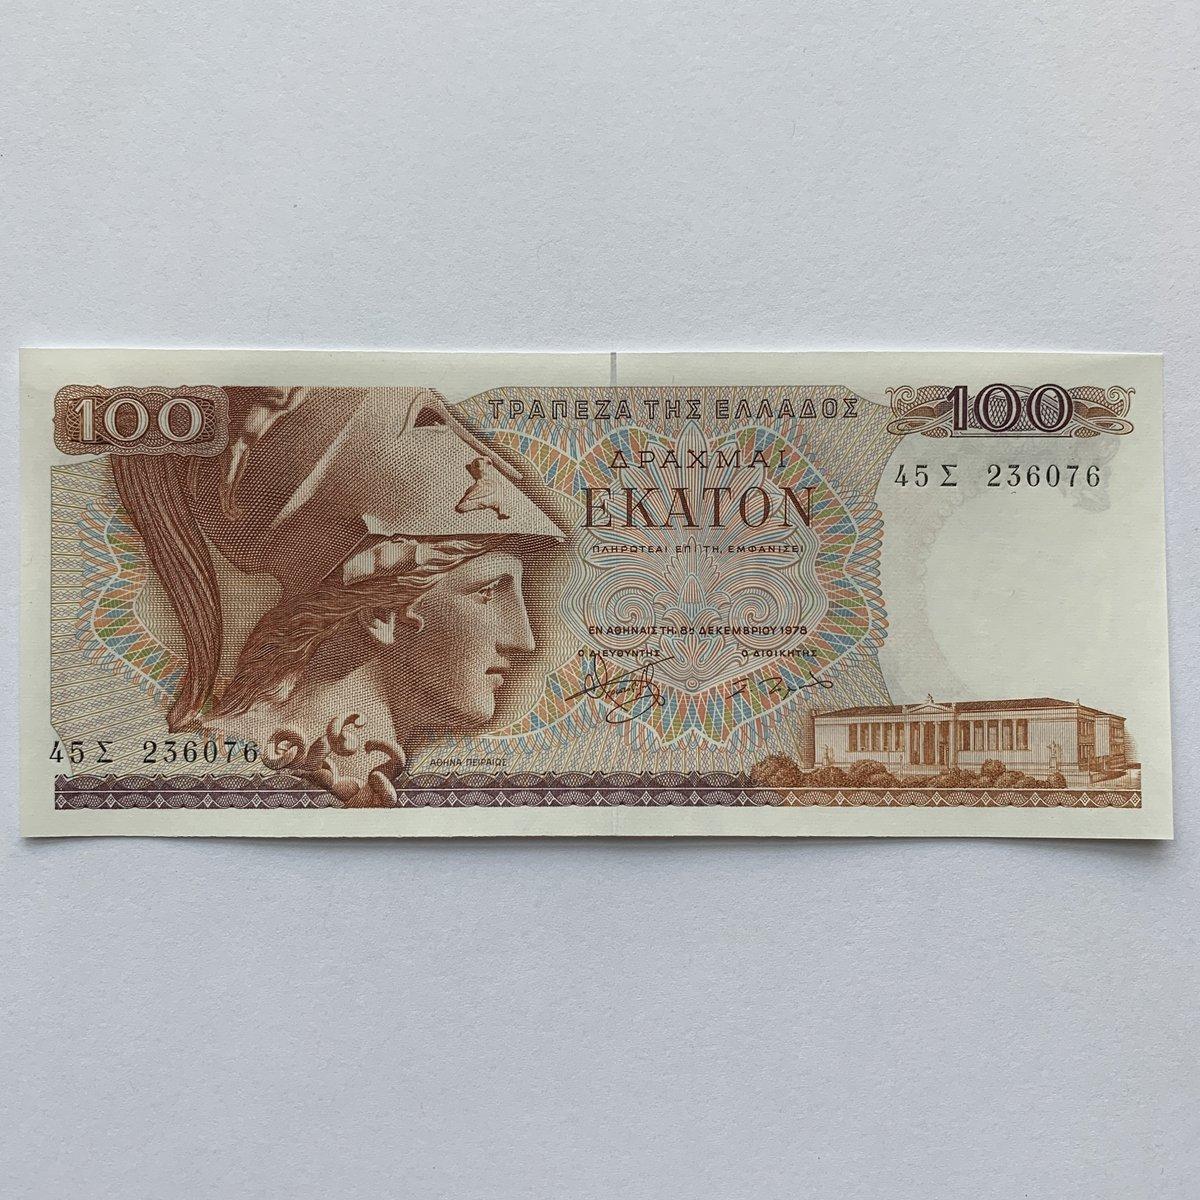 my #etsy shop: 1978 Greek God Athena Greece Banknote 100 Drachmai Currencey Europe Billetes. Bills, Notes, Mythological.  #banknote #billetes #currency #bank #notes #bills #pesos #collectibles #vintage